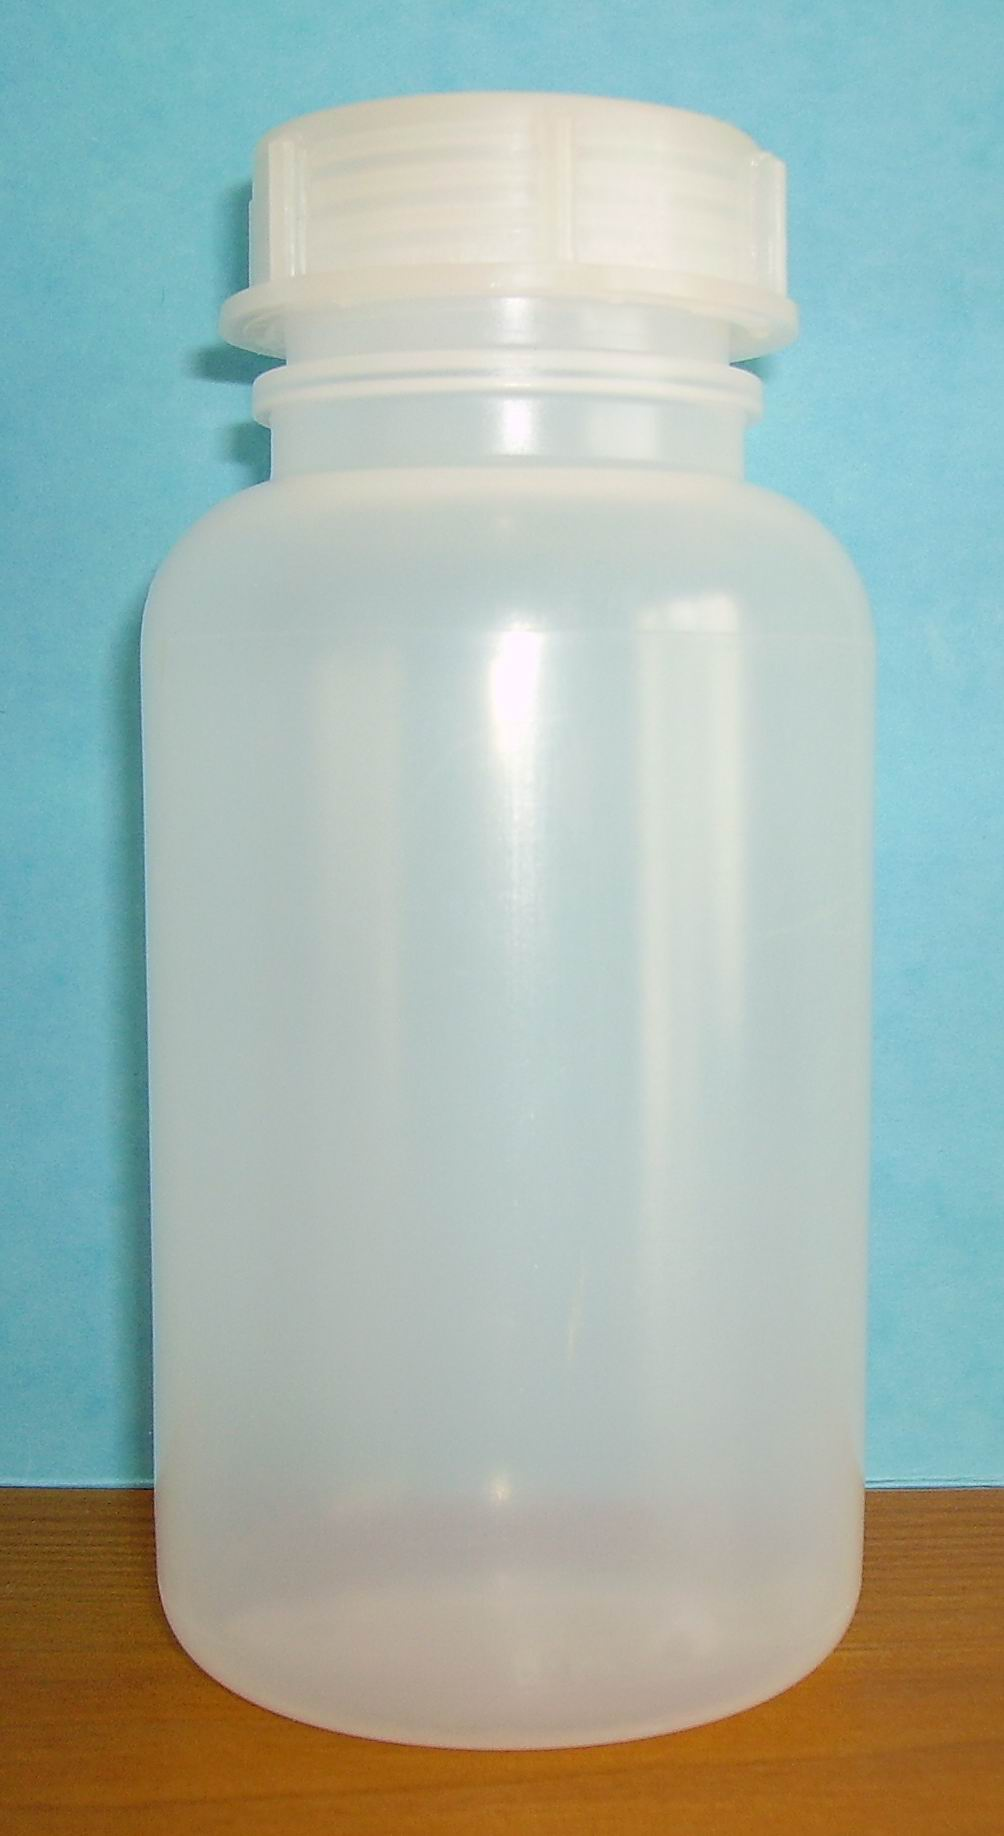 Density Of Plastic >> Polyethylene - Simple English Wikipedia, the free encyclopedia